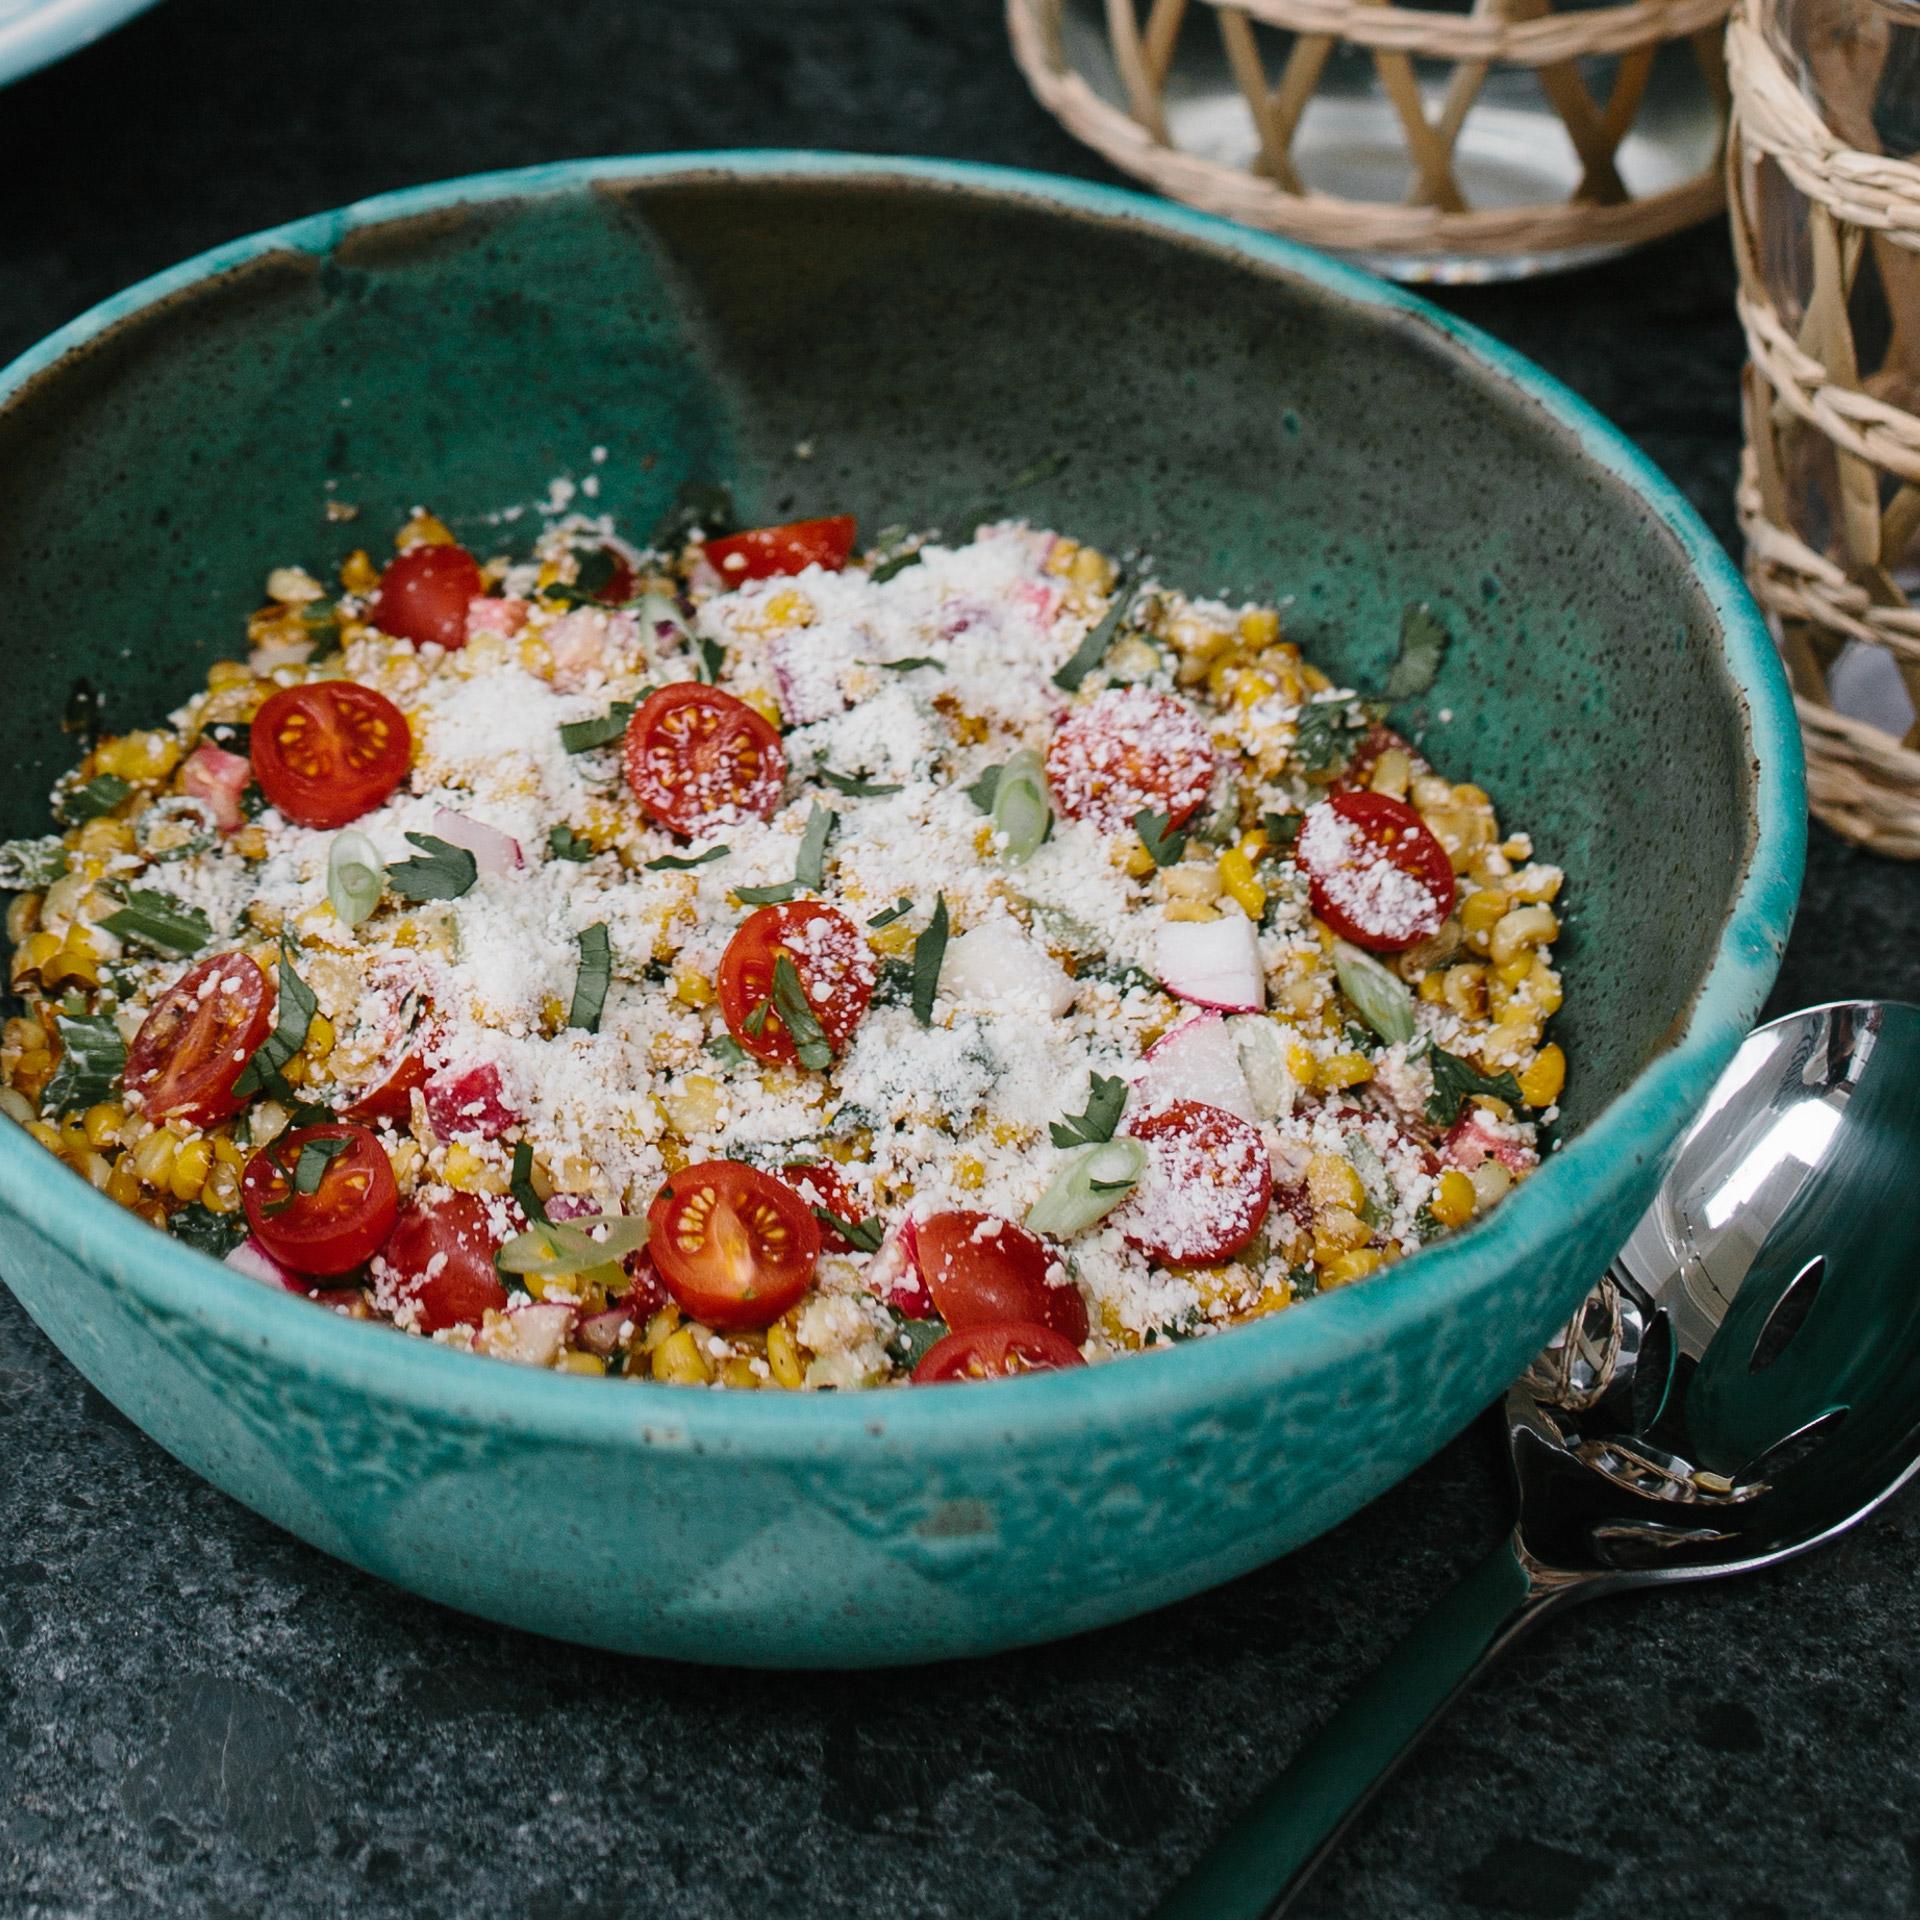 Charred Corn and Tomato Salad with Radishes and Cotija